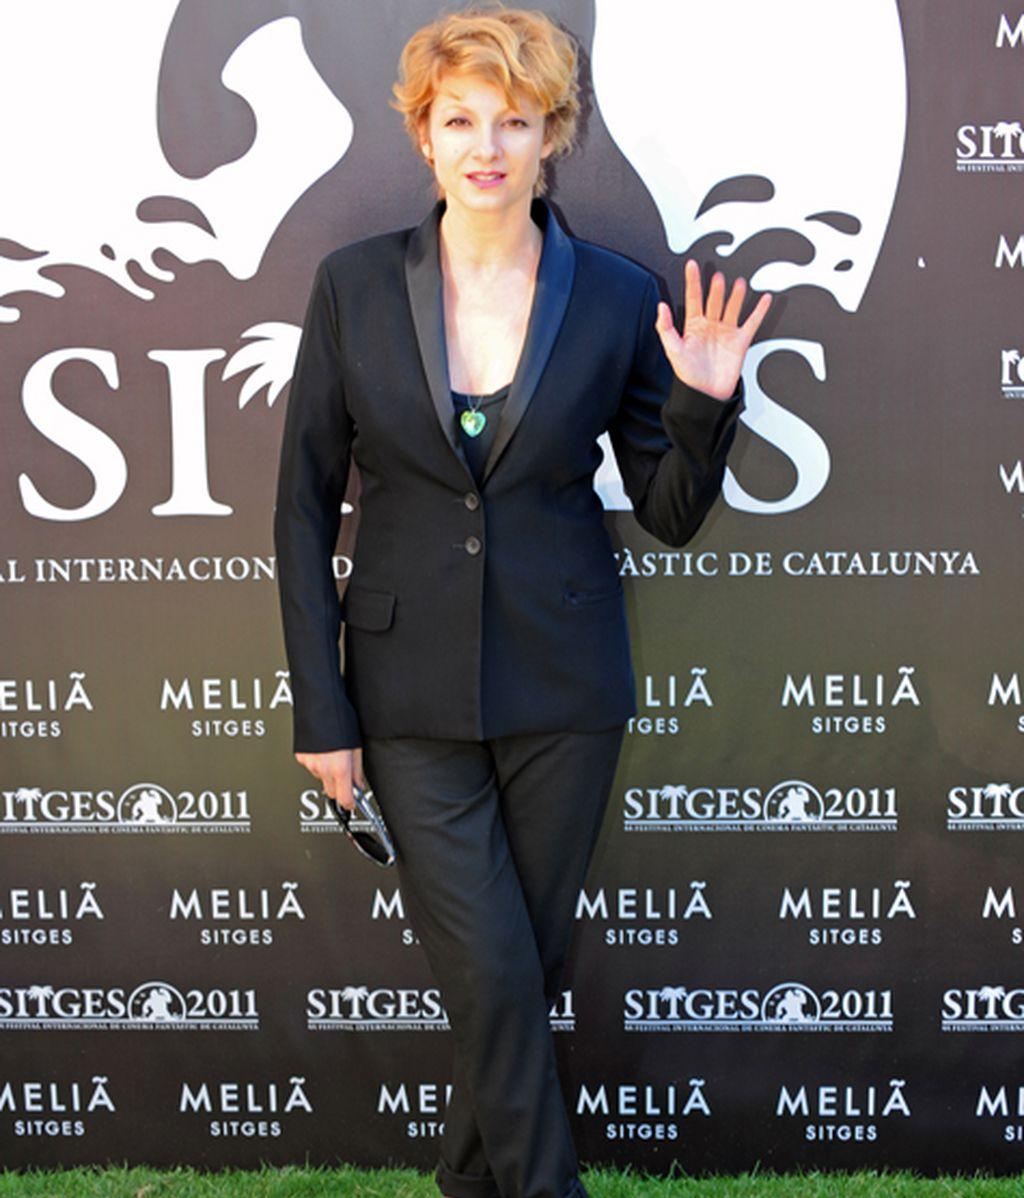 Silvestre, asilvestrado 'casual' en Sitges